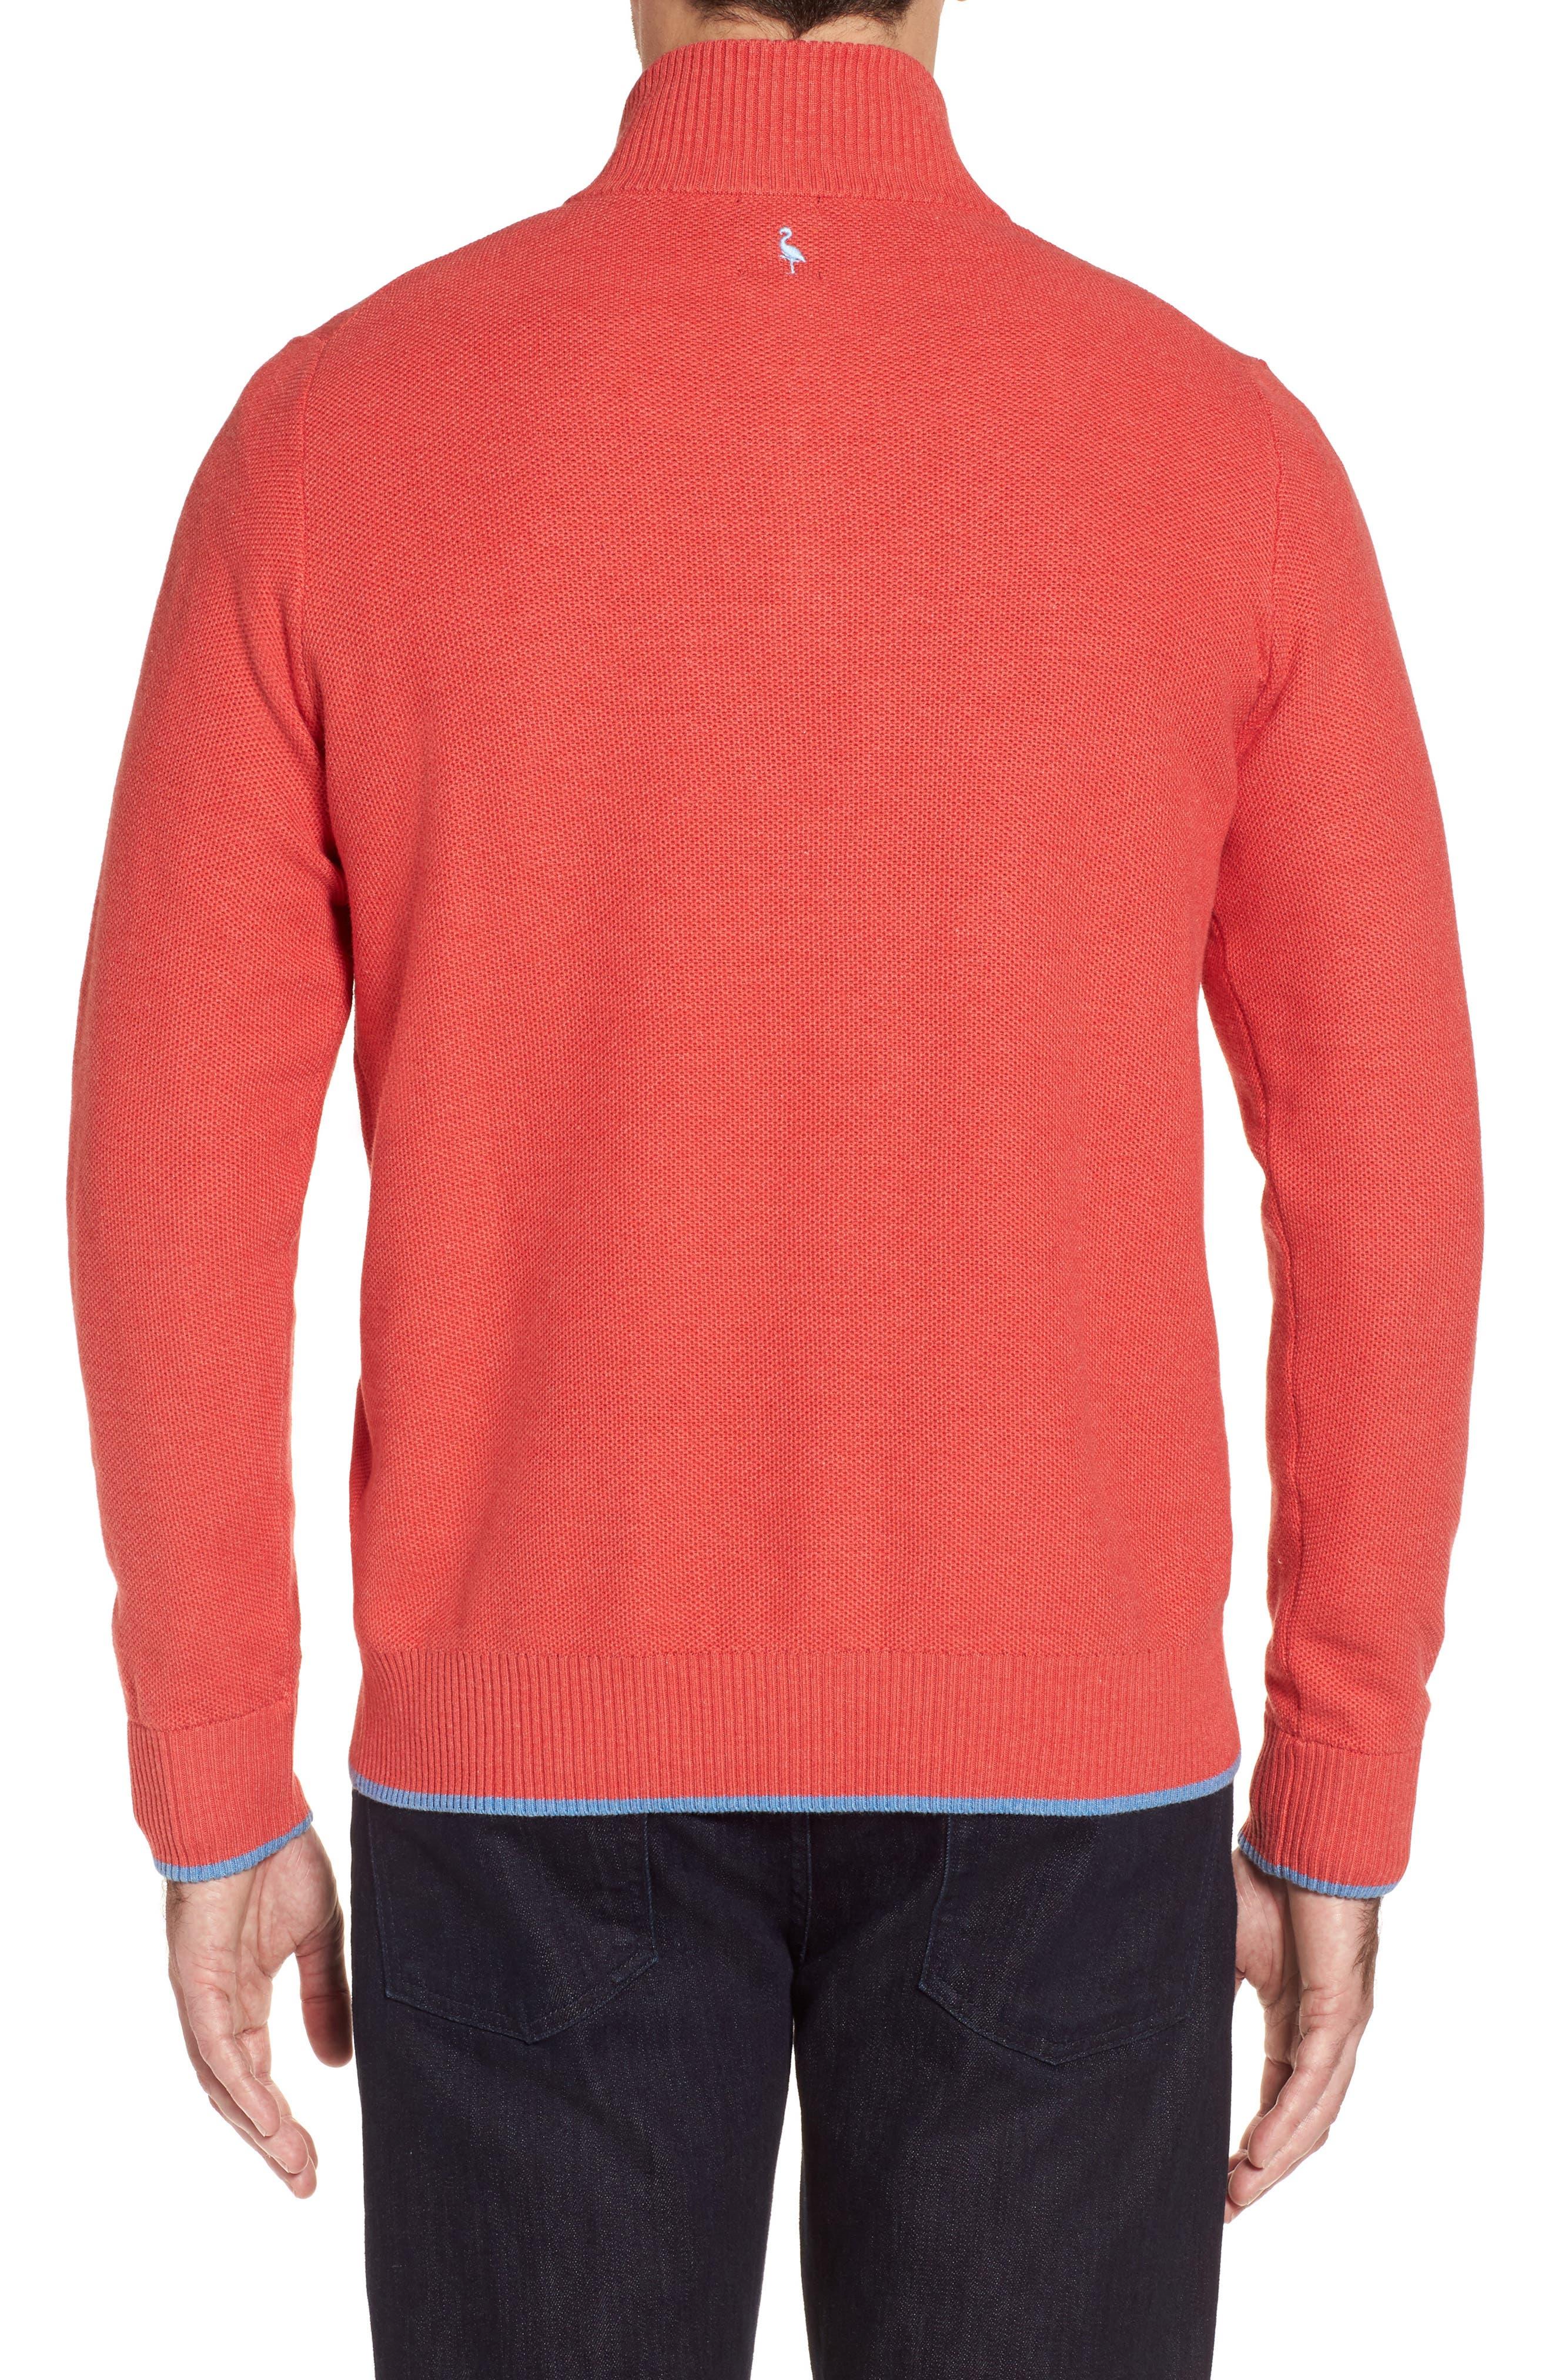 Sorrel Tipped Quarter Zip Sweater,                             Alternate thumbnail 2, color,                             950